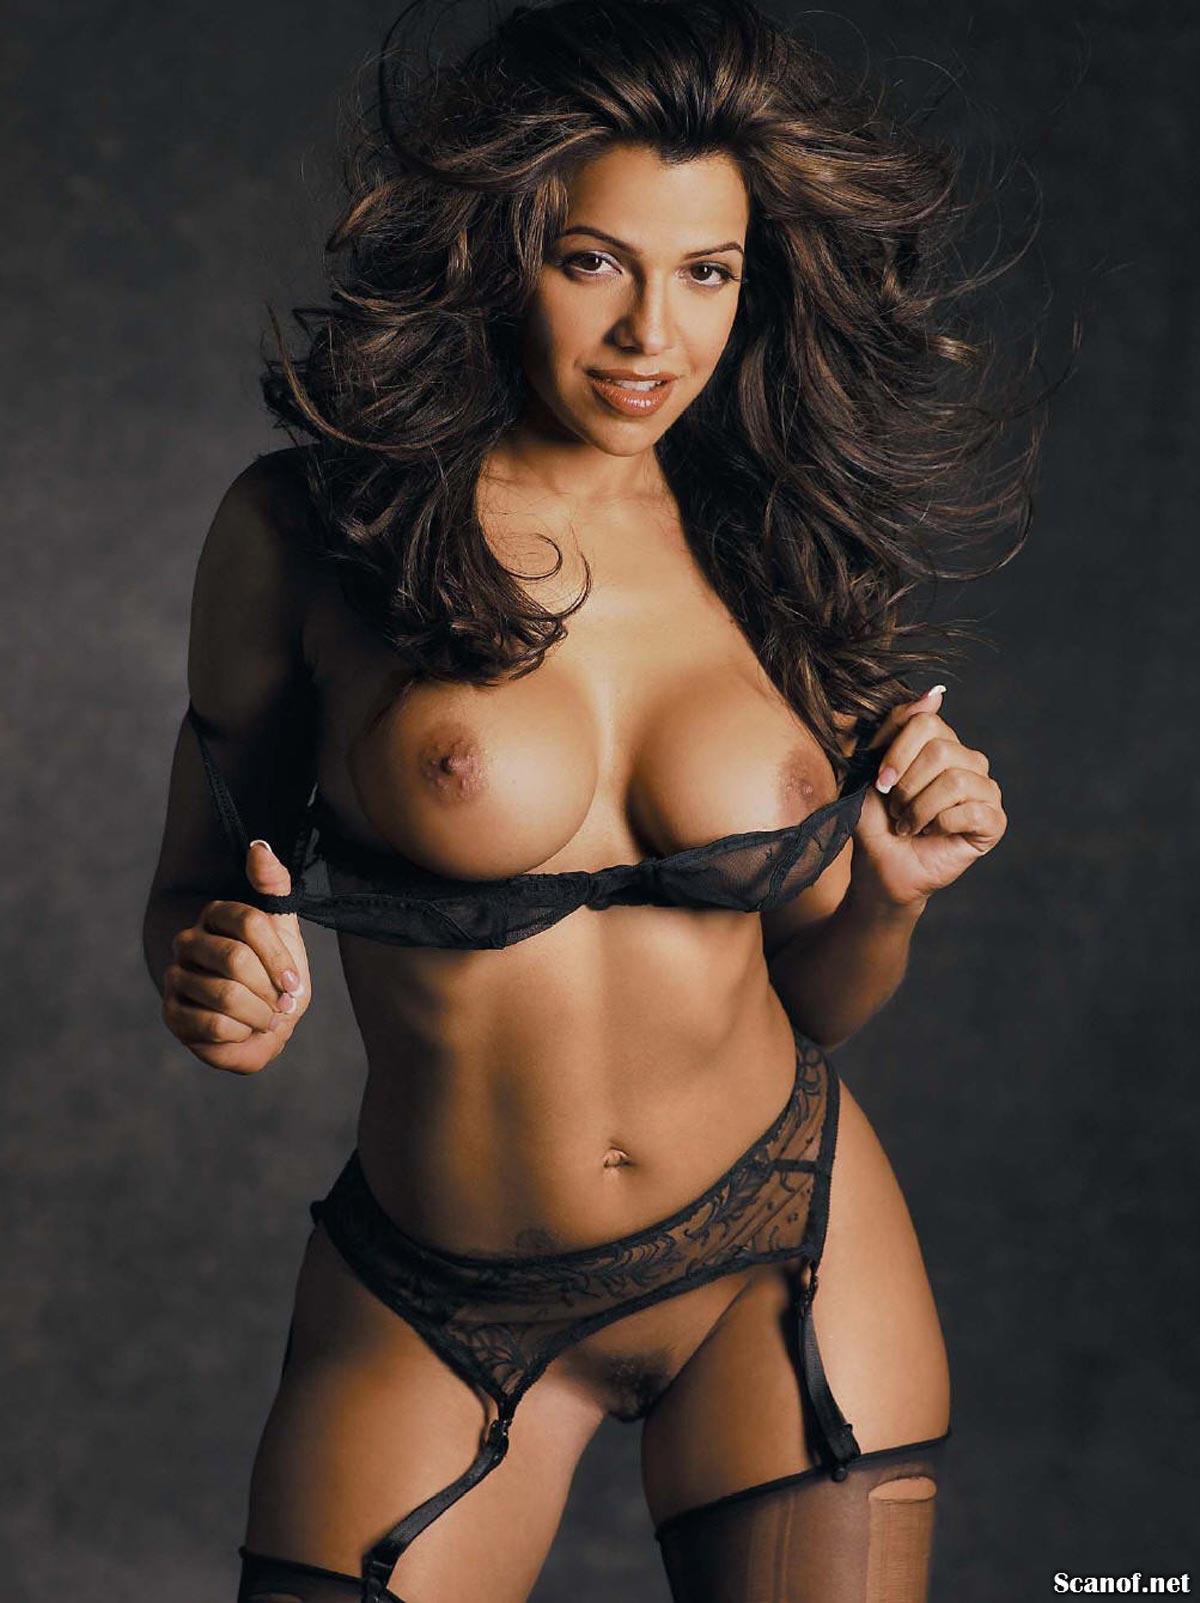 Vida Guerra in Playboy Magazine - Presents